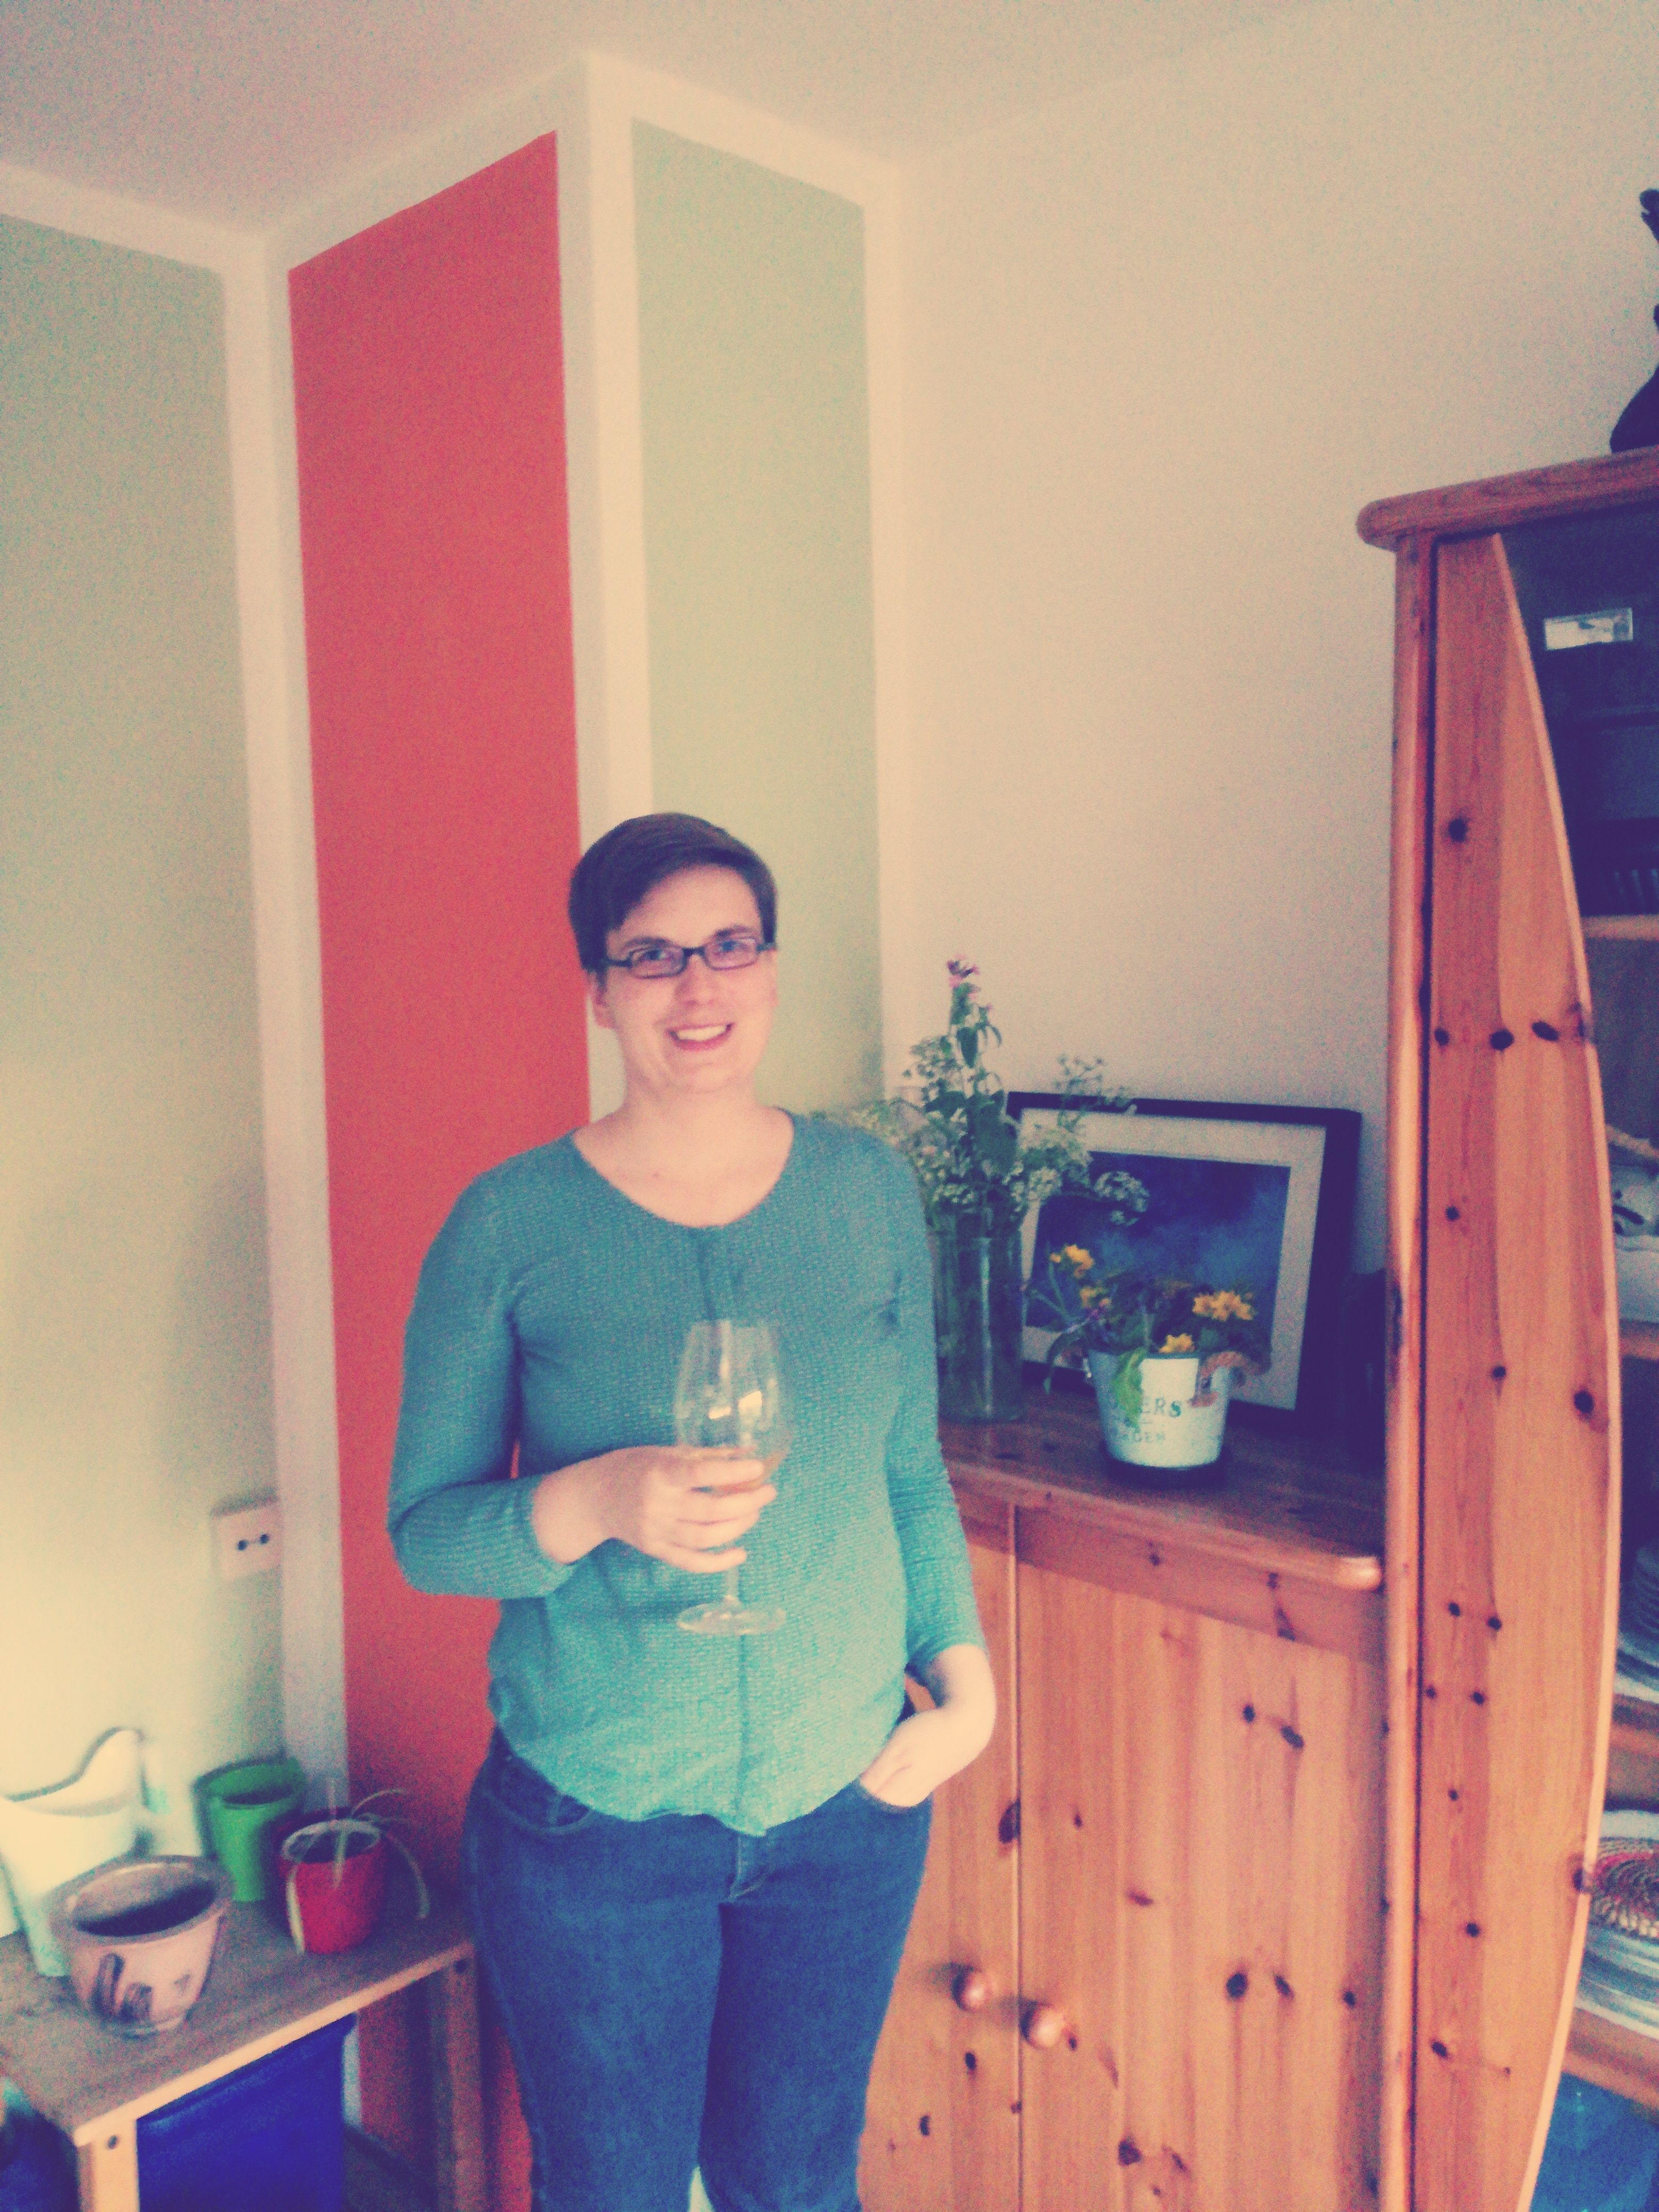 anne language exchange mannheim mannheim meetup. Black Bedroom Furniture Sets. Home Design Ideas